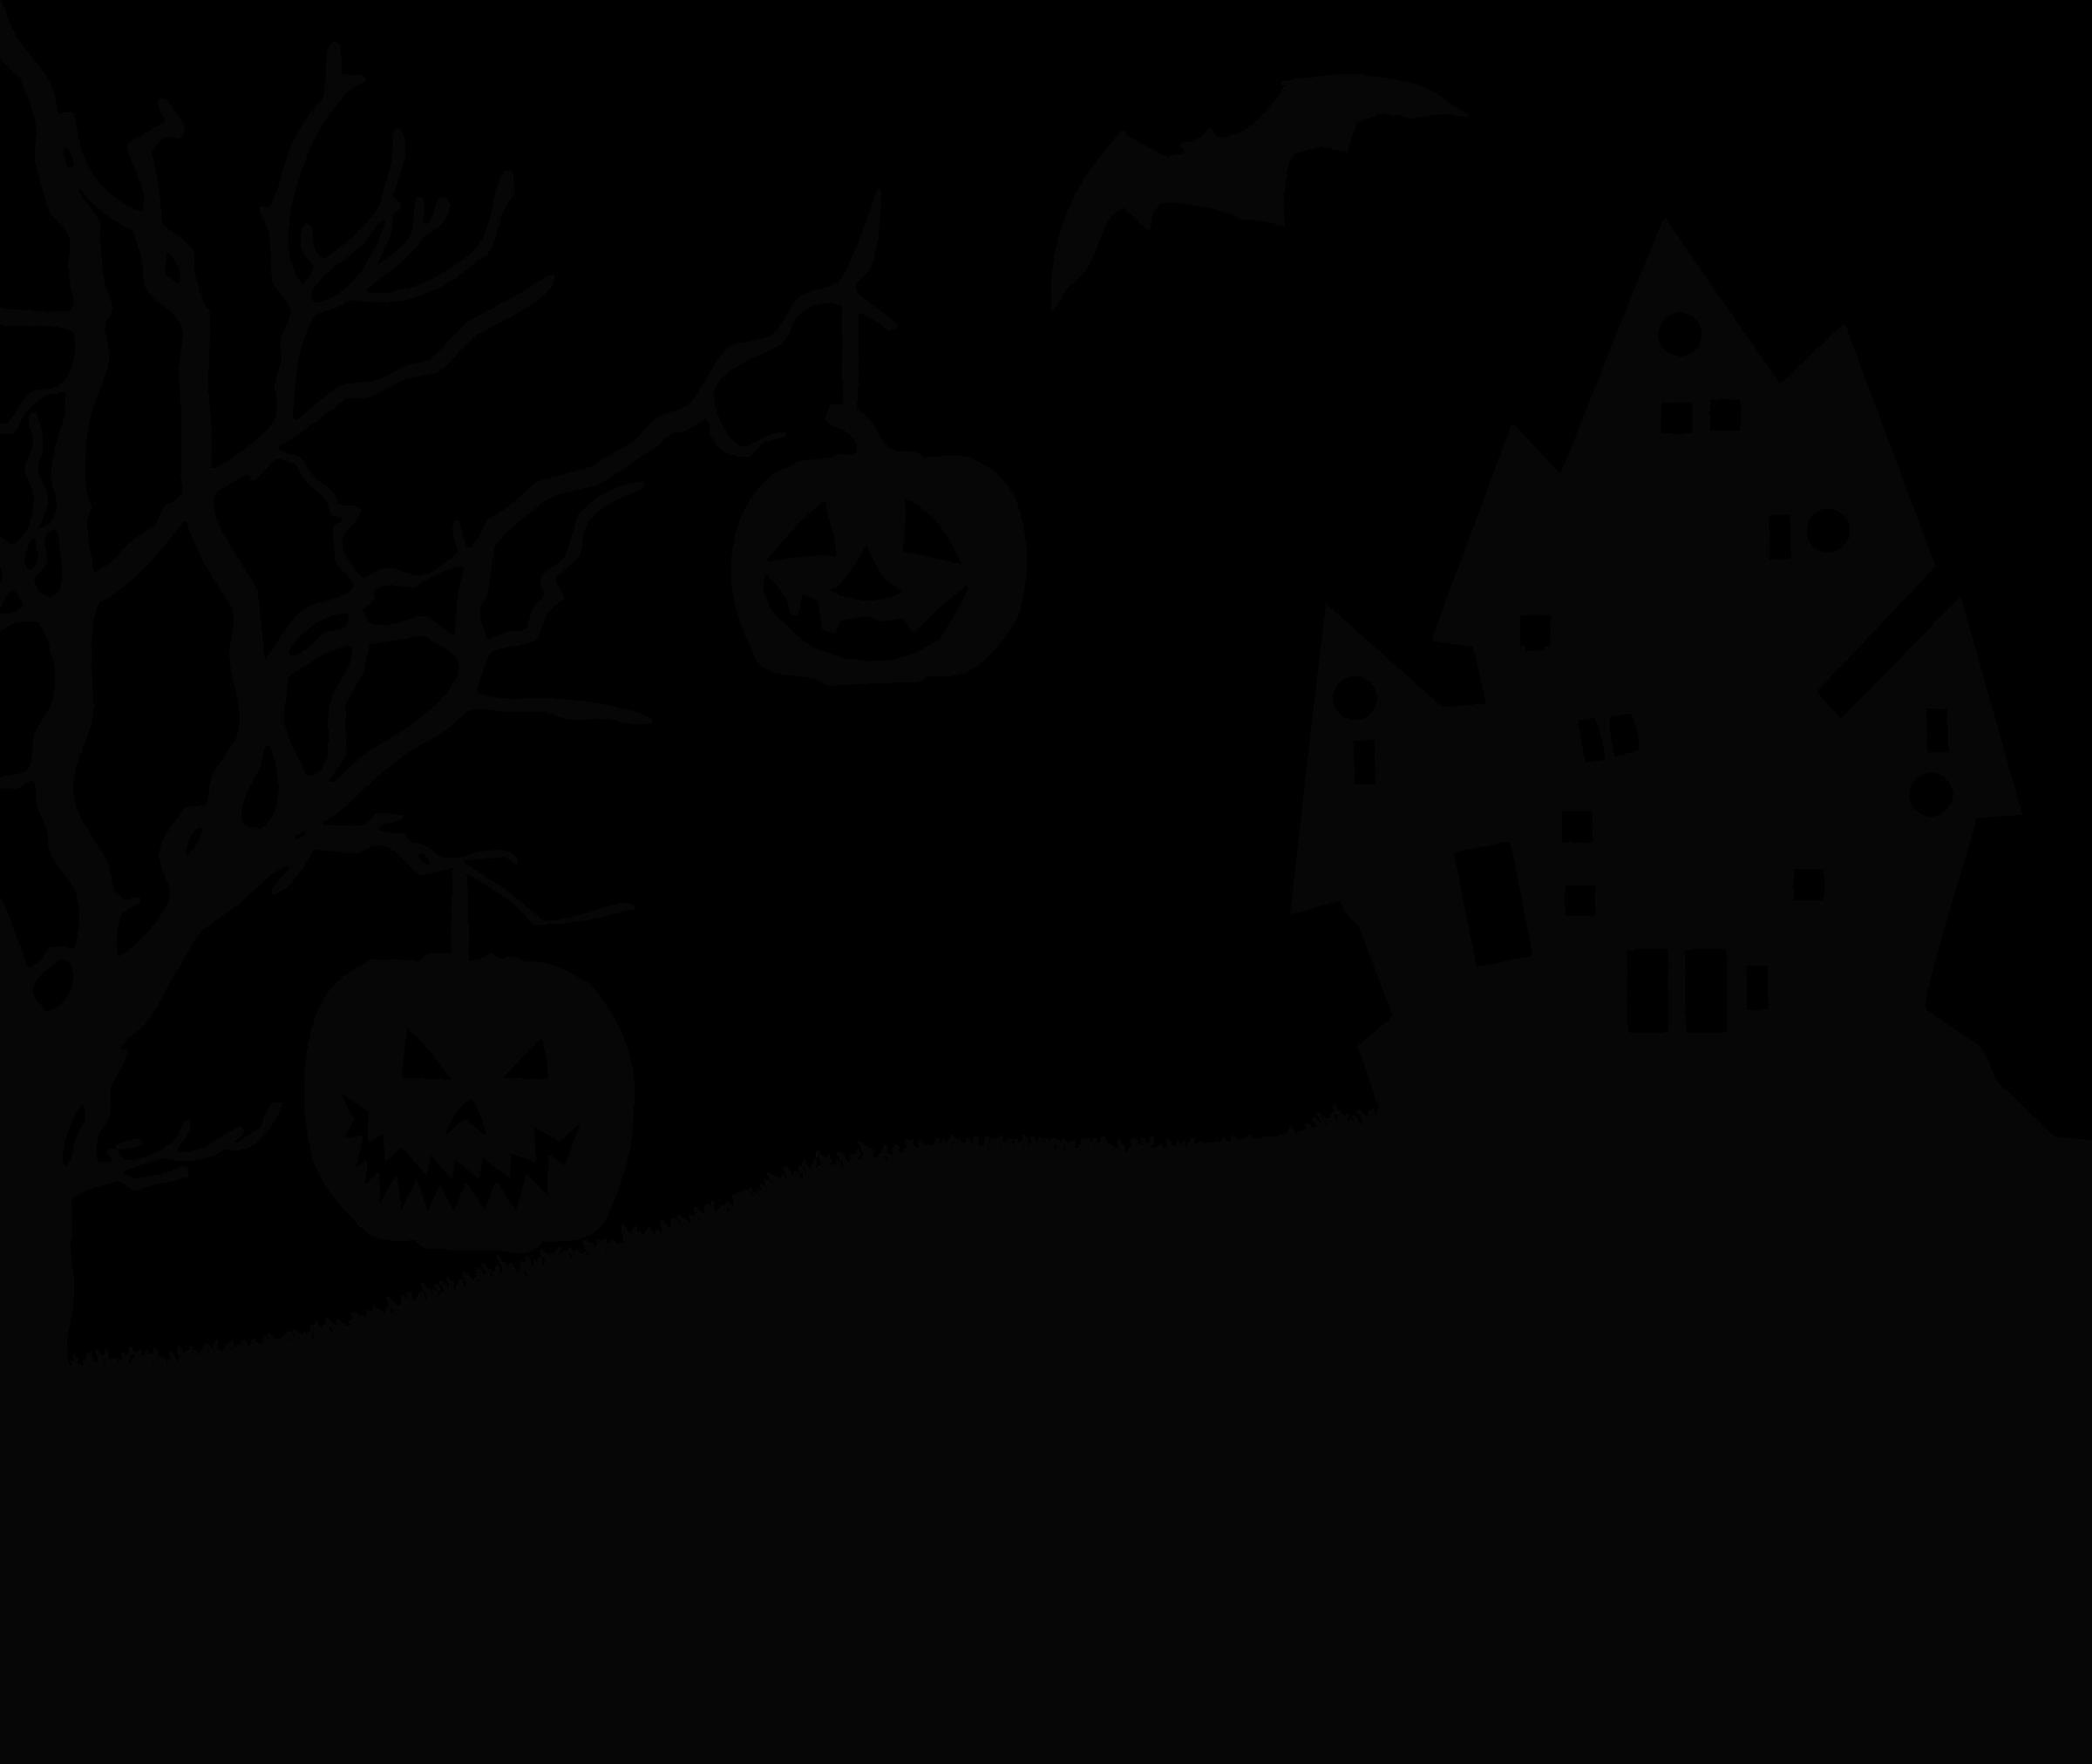 Clipart Halloween Landscape Silhouette